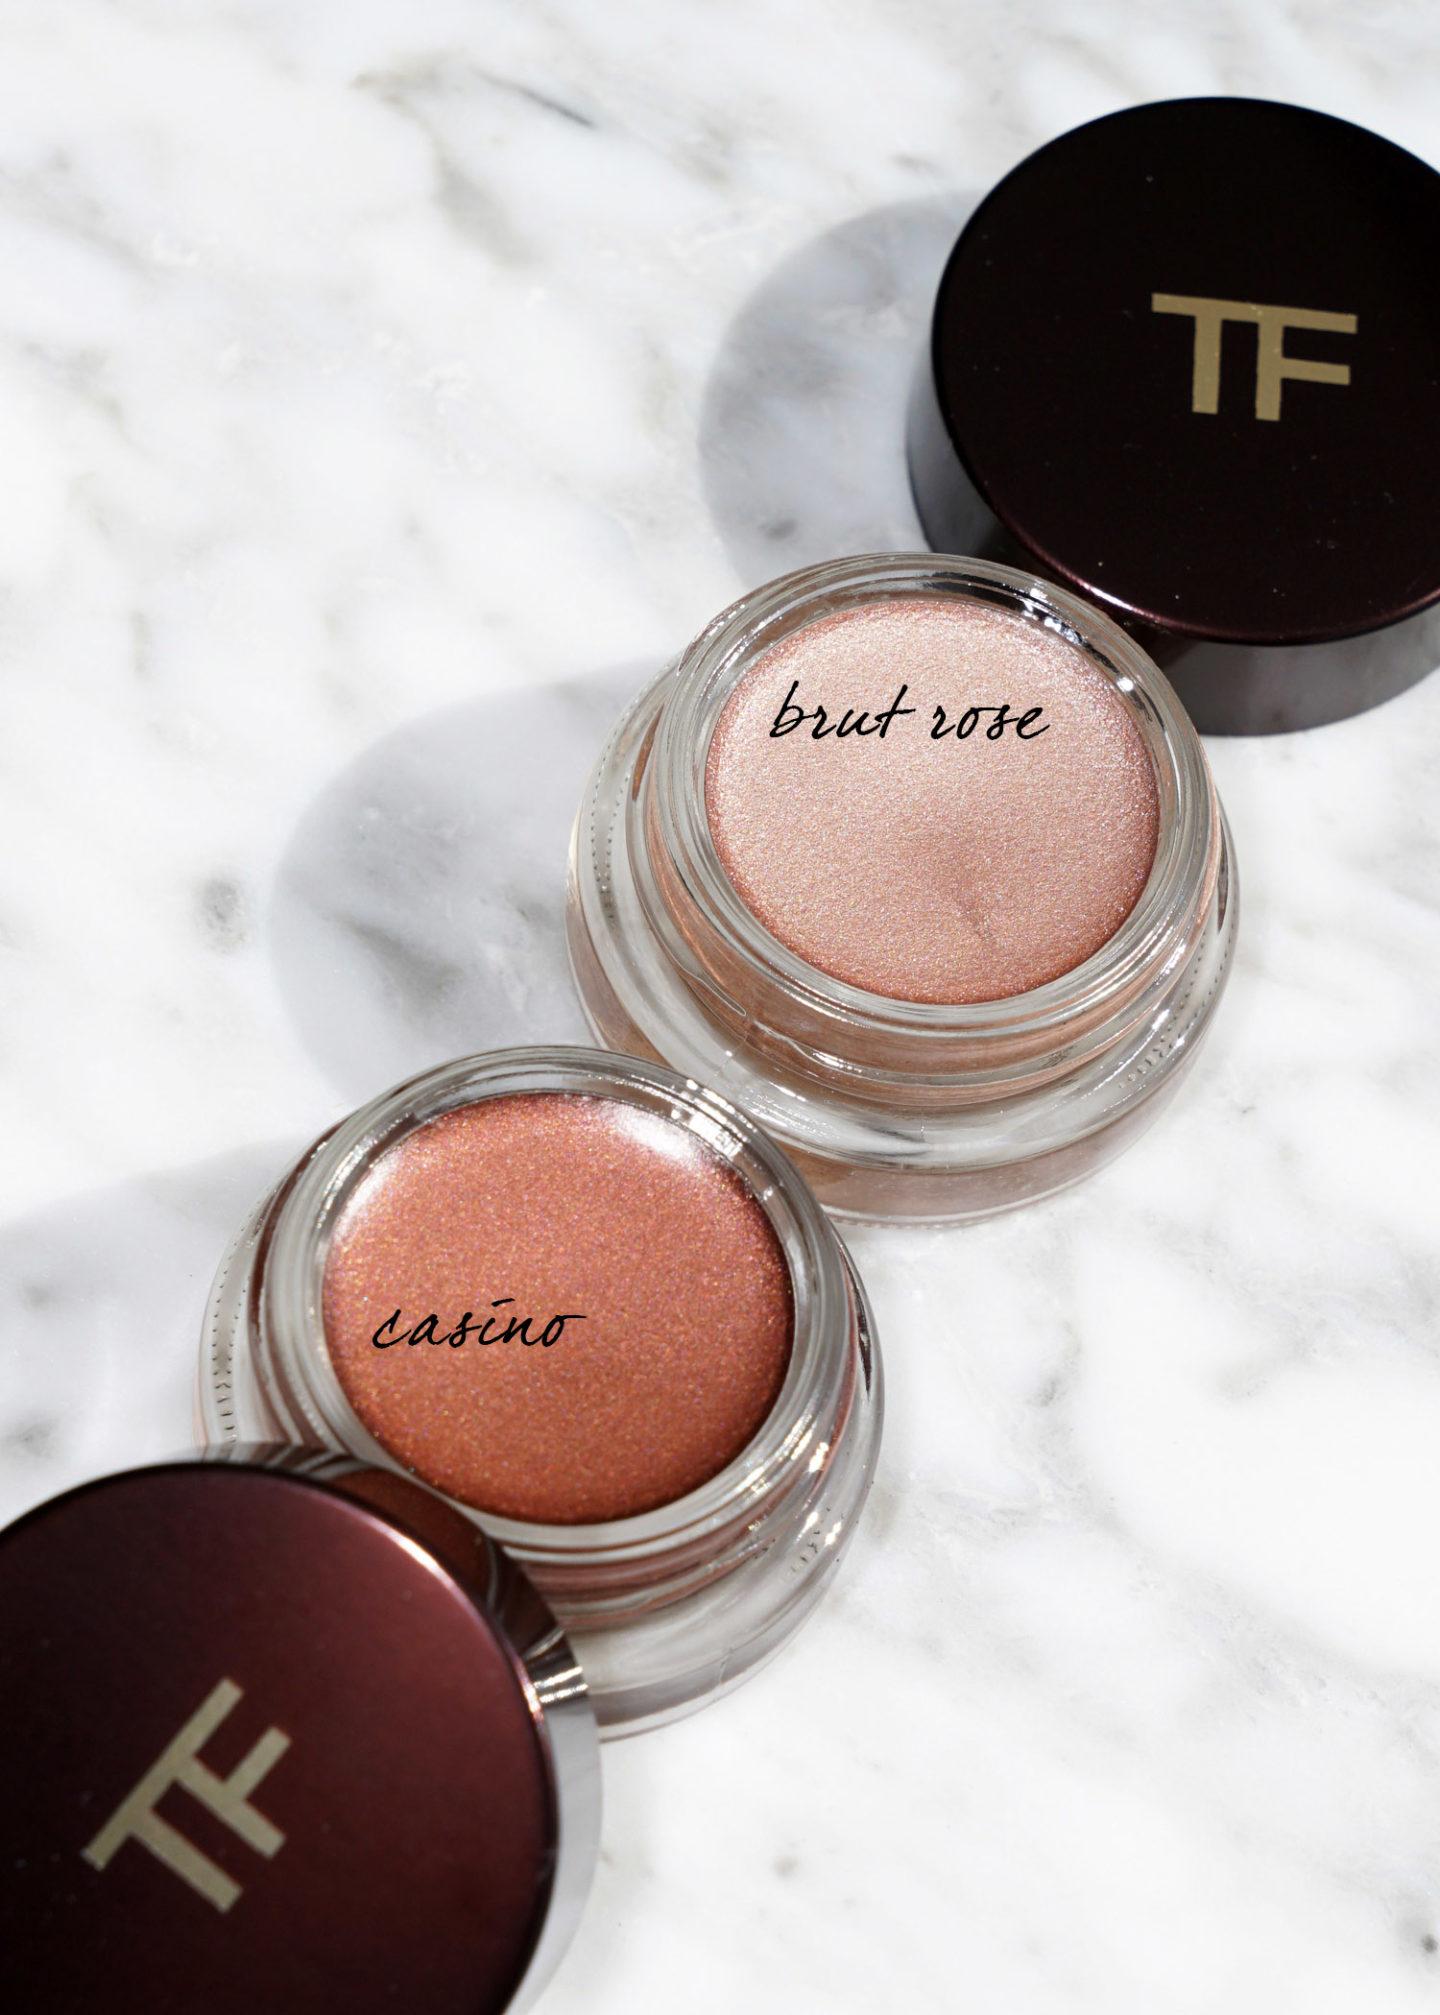 Tom Ford Emotionproof Eye Colors Brut Rose et Casino | Le look book beauté